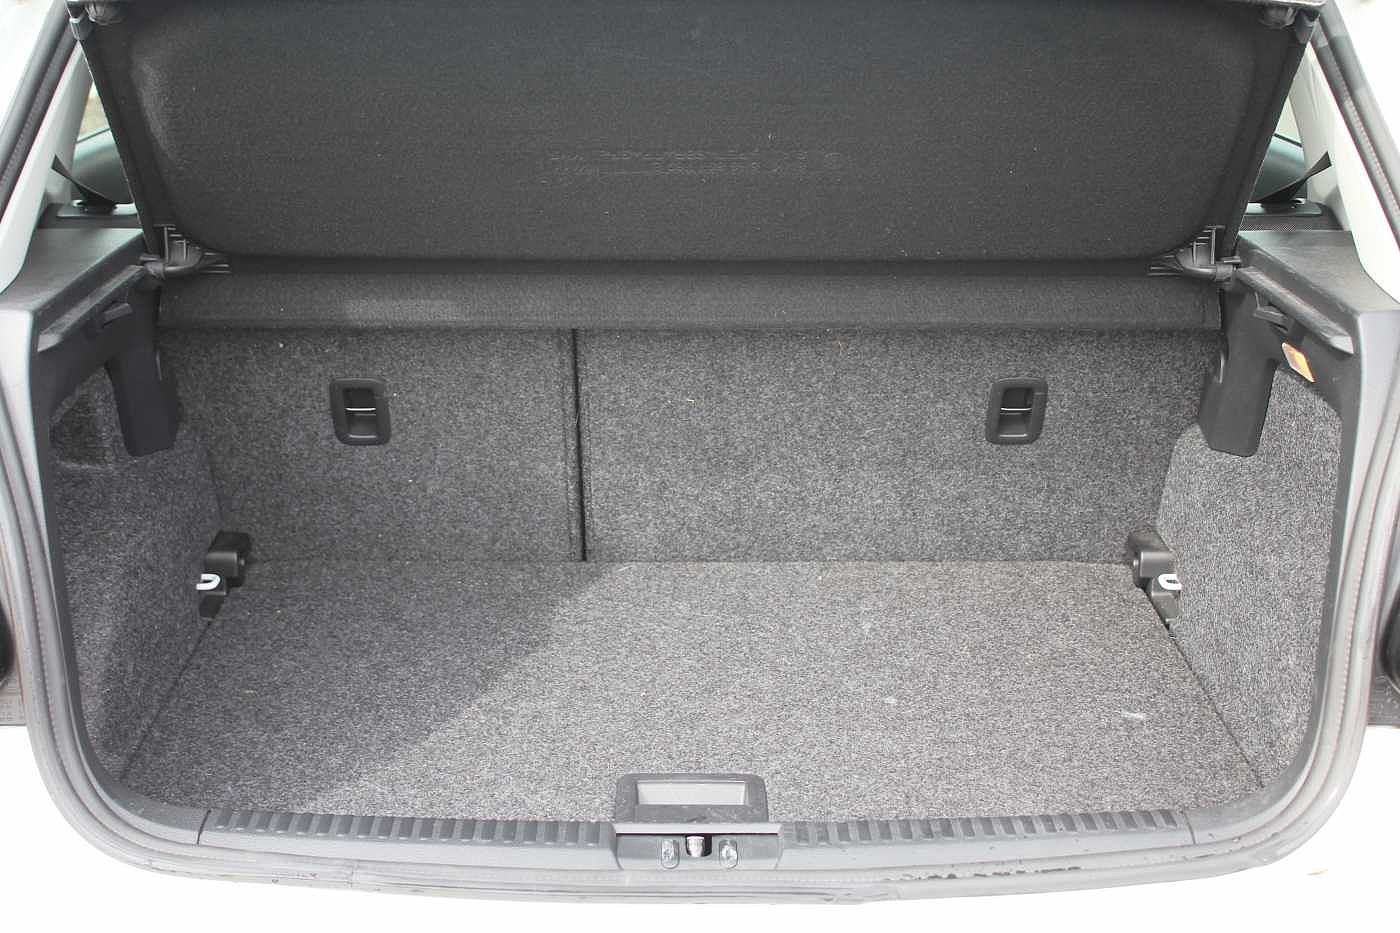 Volkswagen Polo 1.2 TSI SE 90PS 5Dr